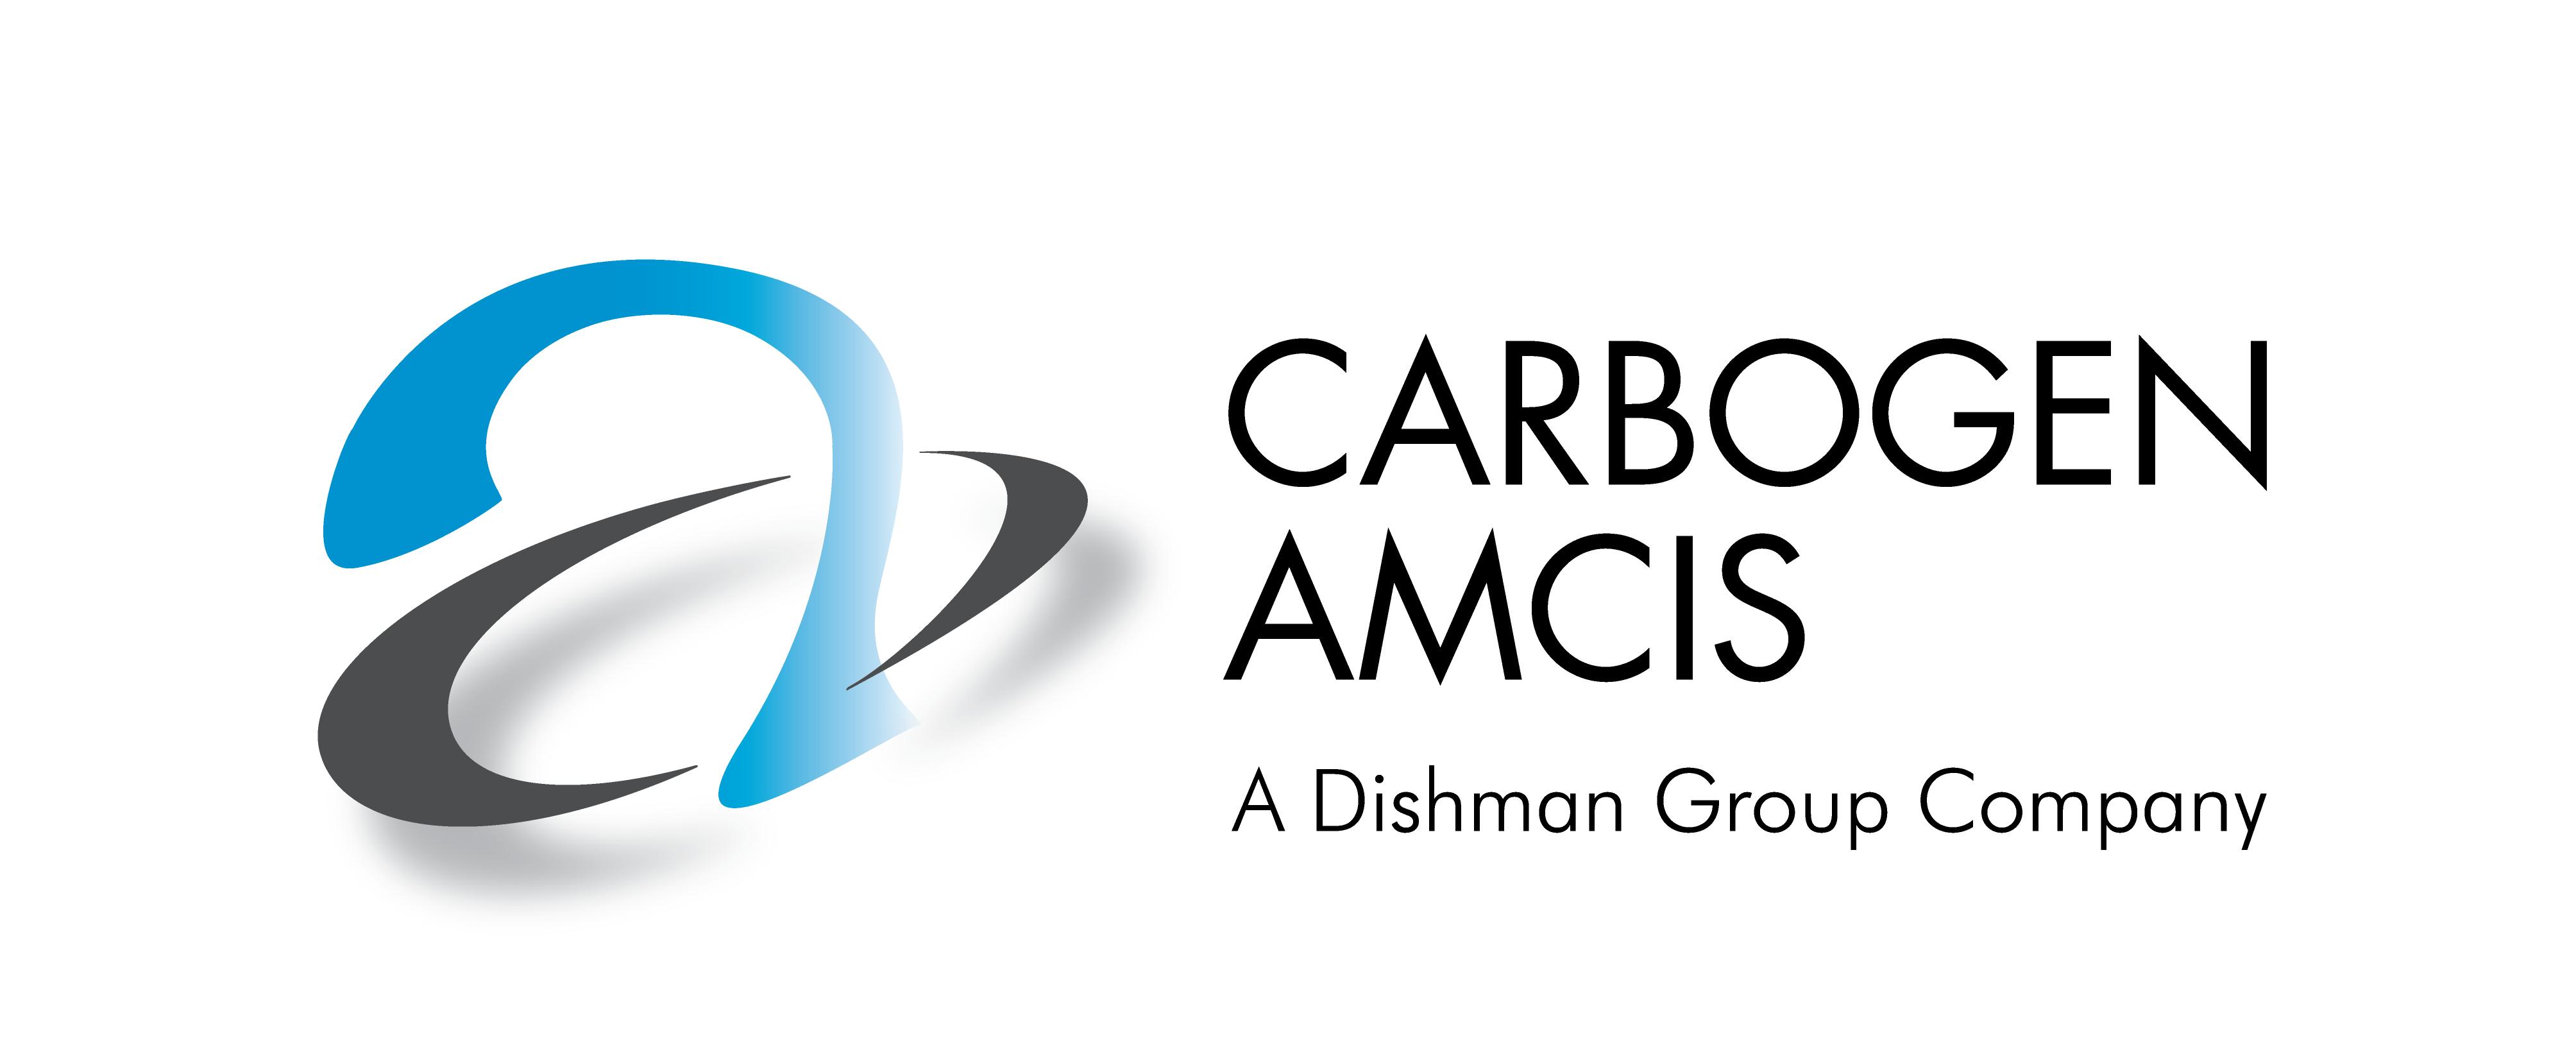 Carbogen-Amcis